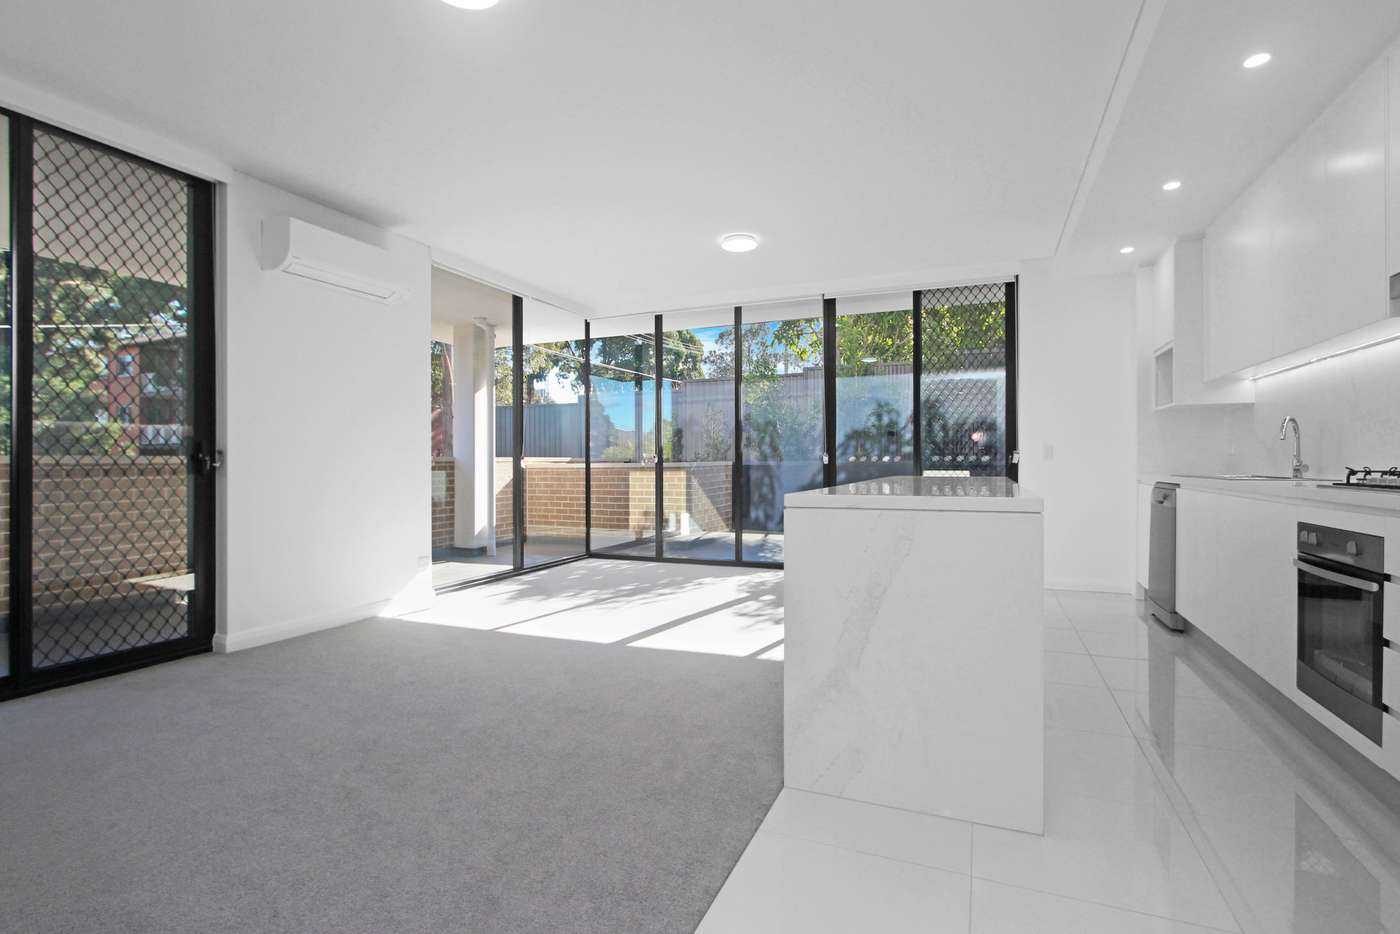 Main view of Homely apartment listing, 3/6 Buchanan Street, Carlton NSW 2218